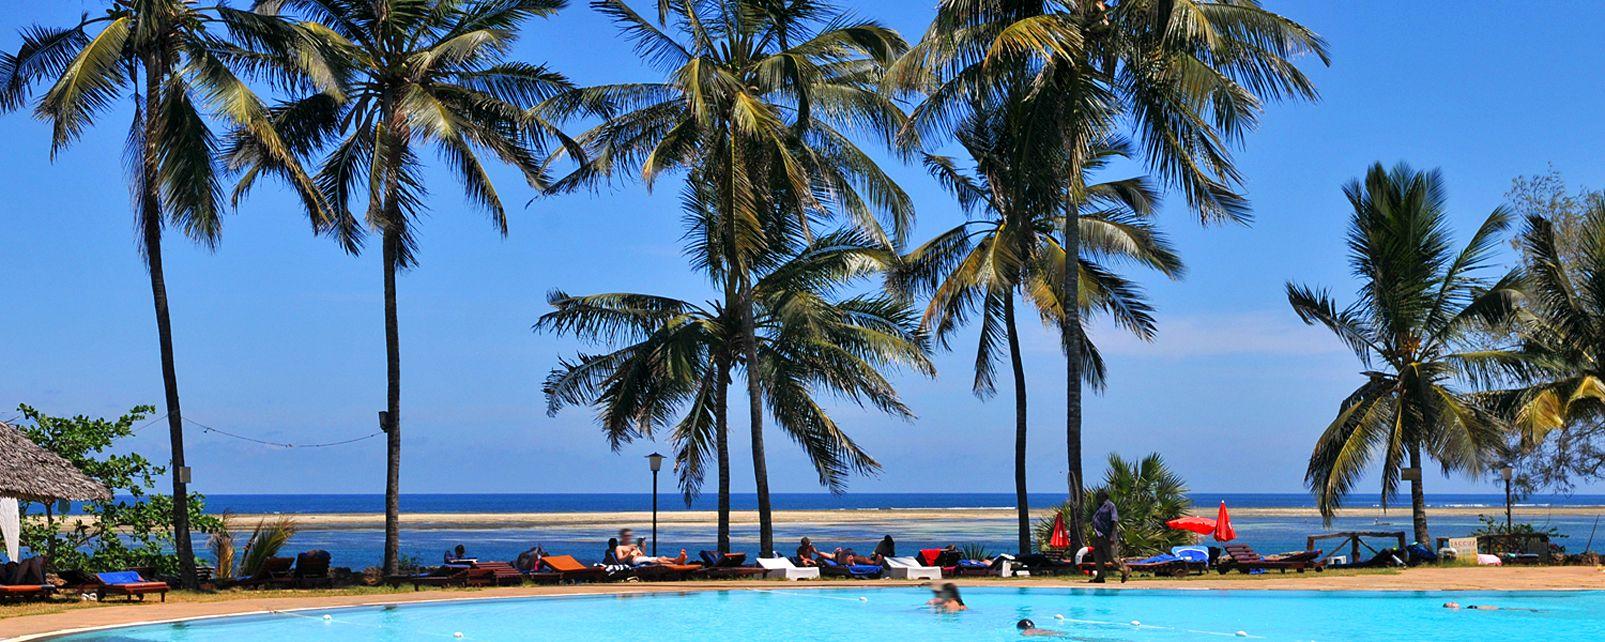 Hotel Reef Hotel